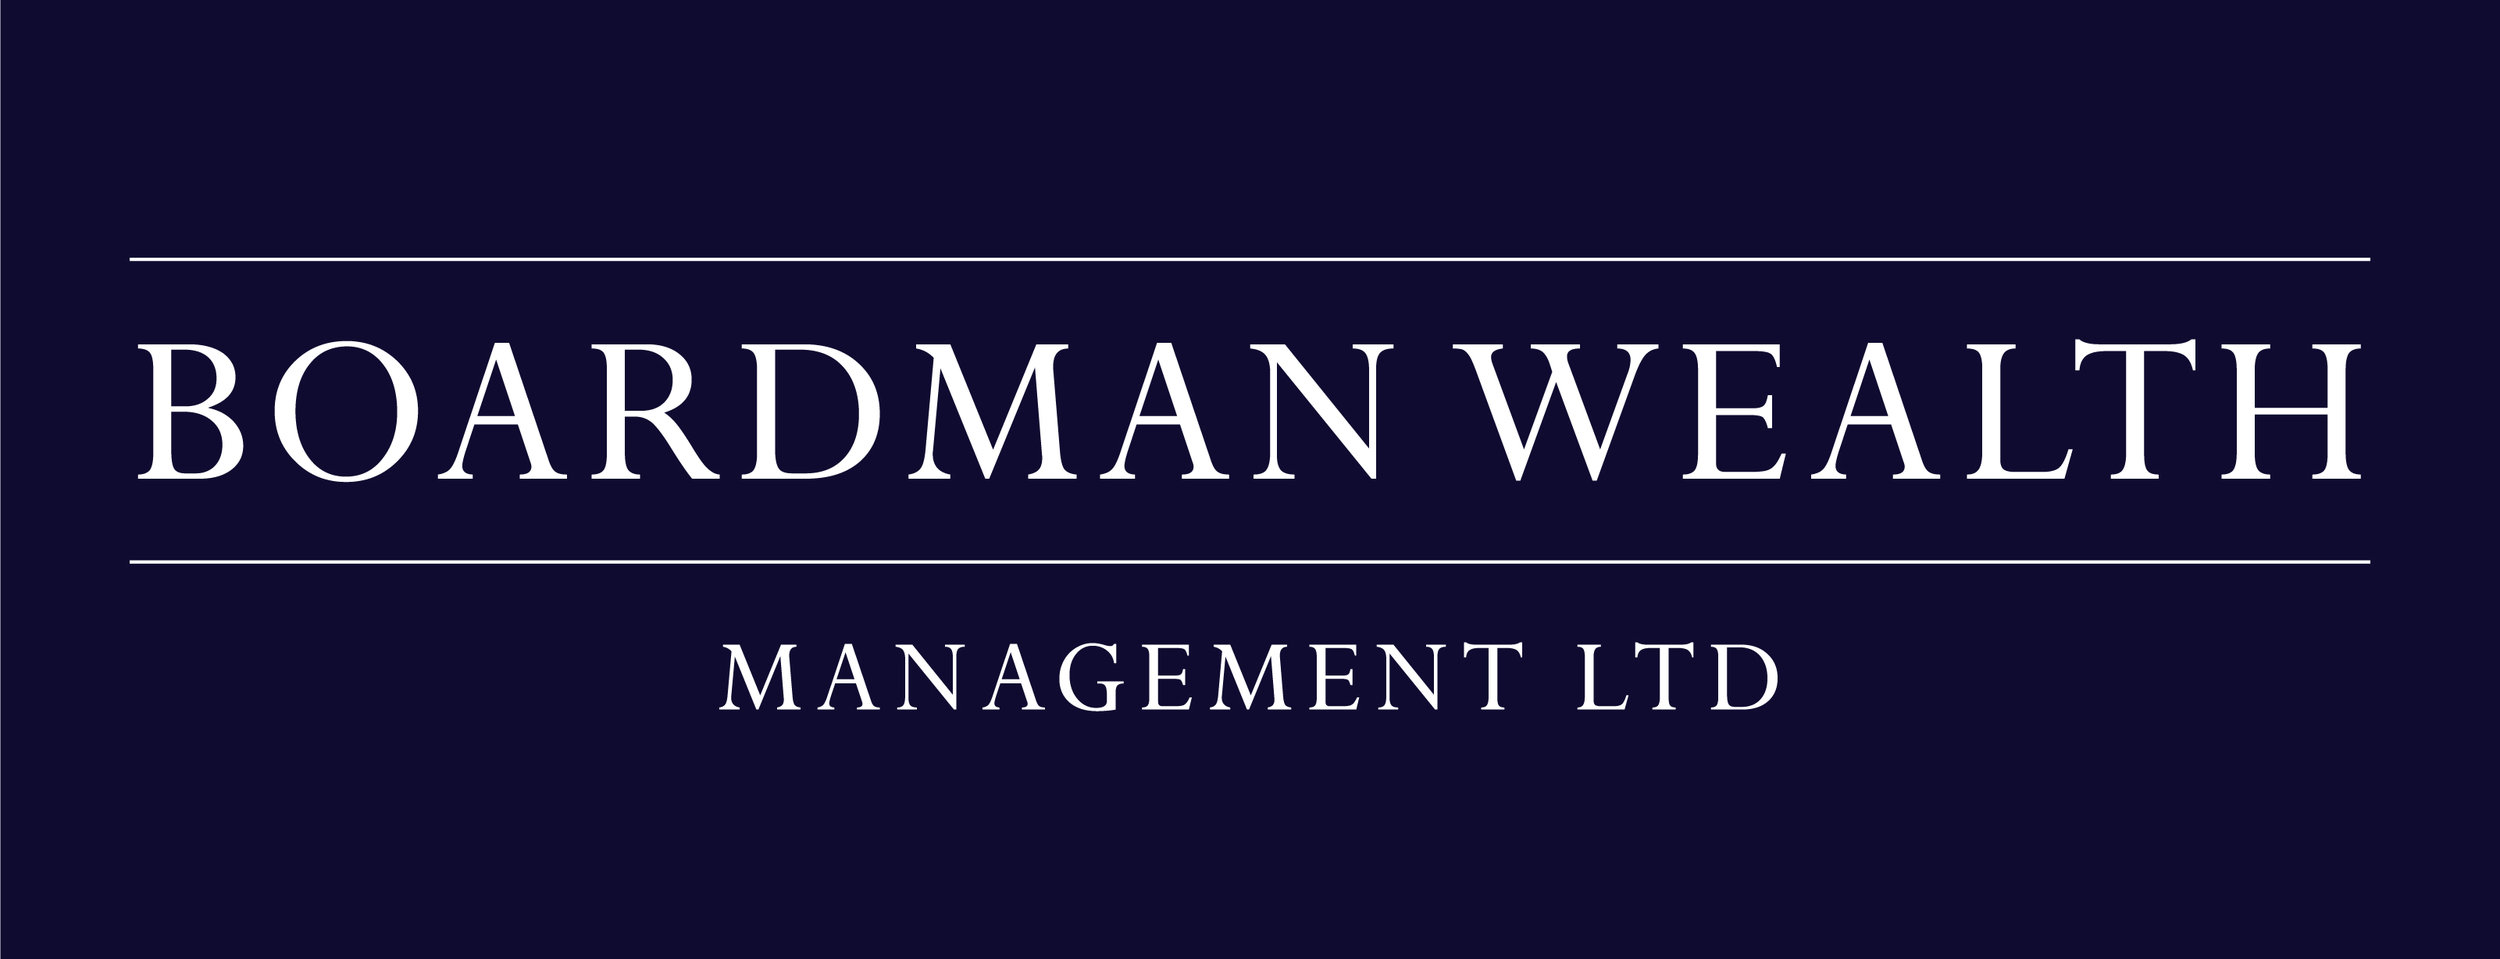 boardman wm ltd - logo jpeg Blue.jpg